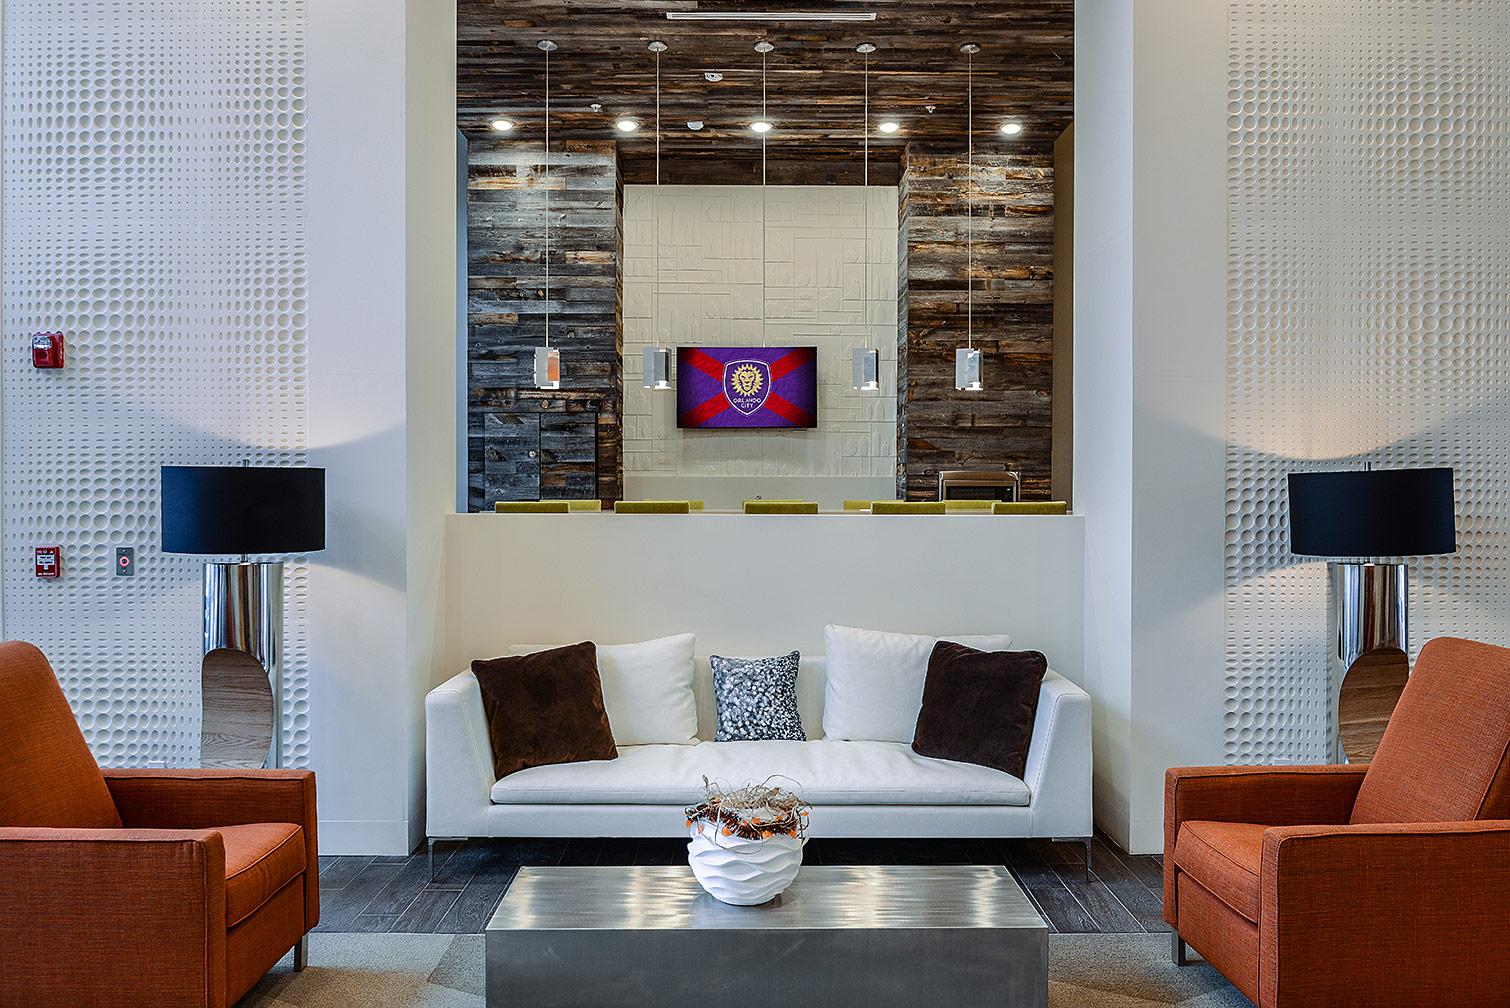 Greystar--EOS-Apartments-8637.jpg